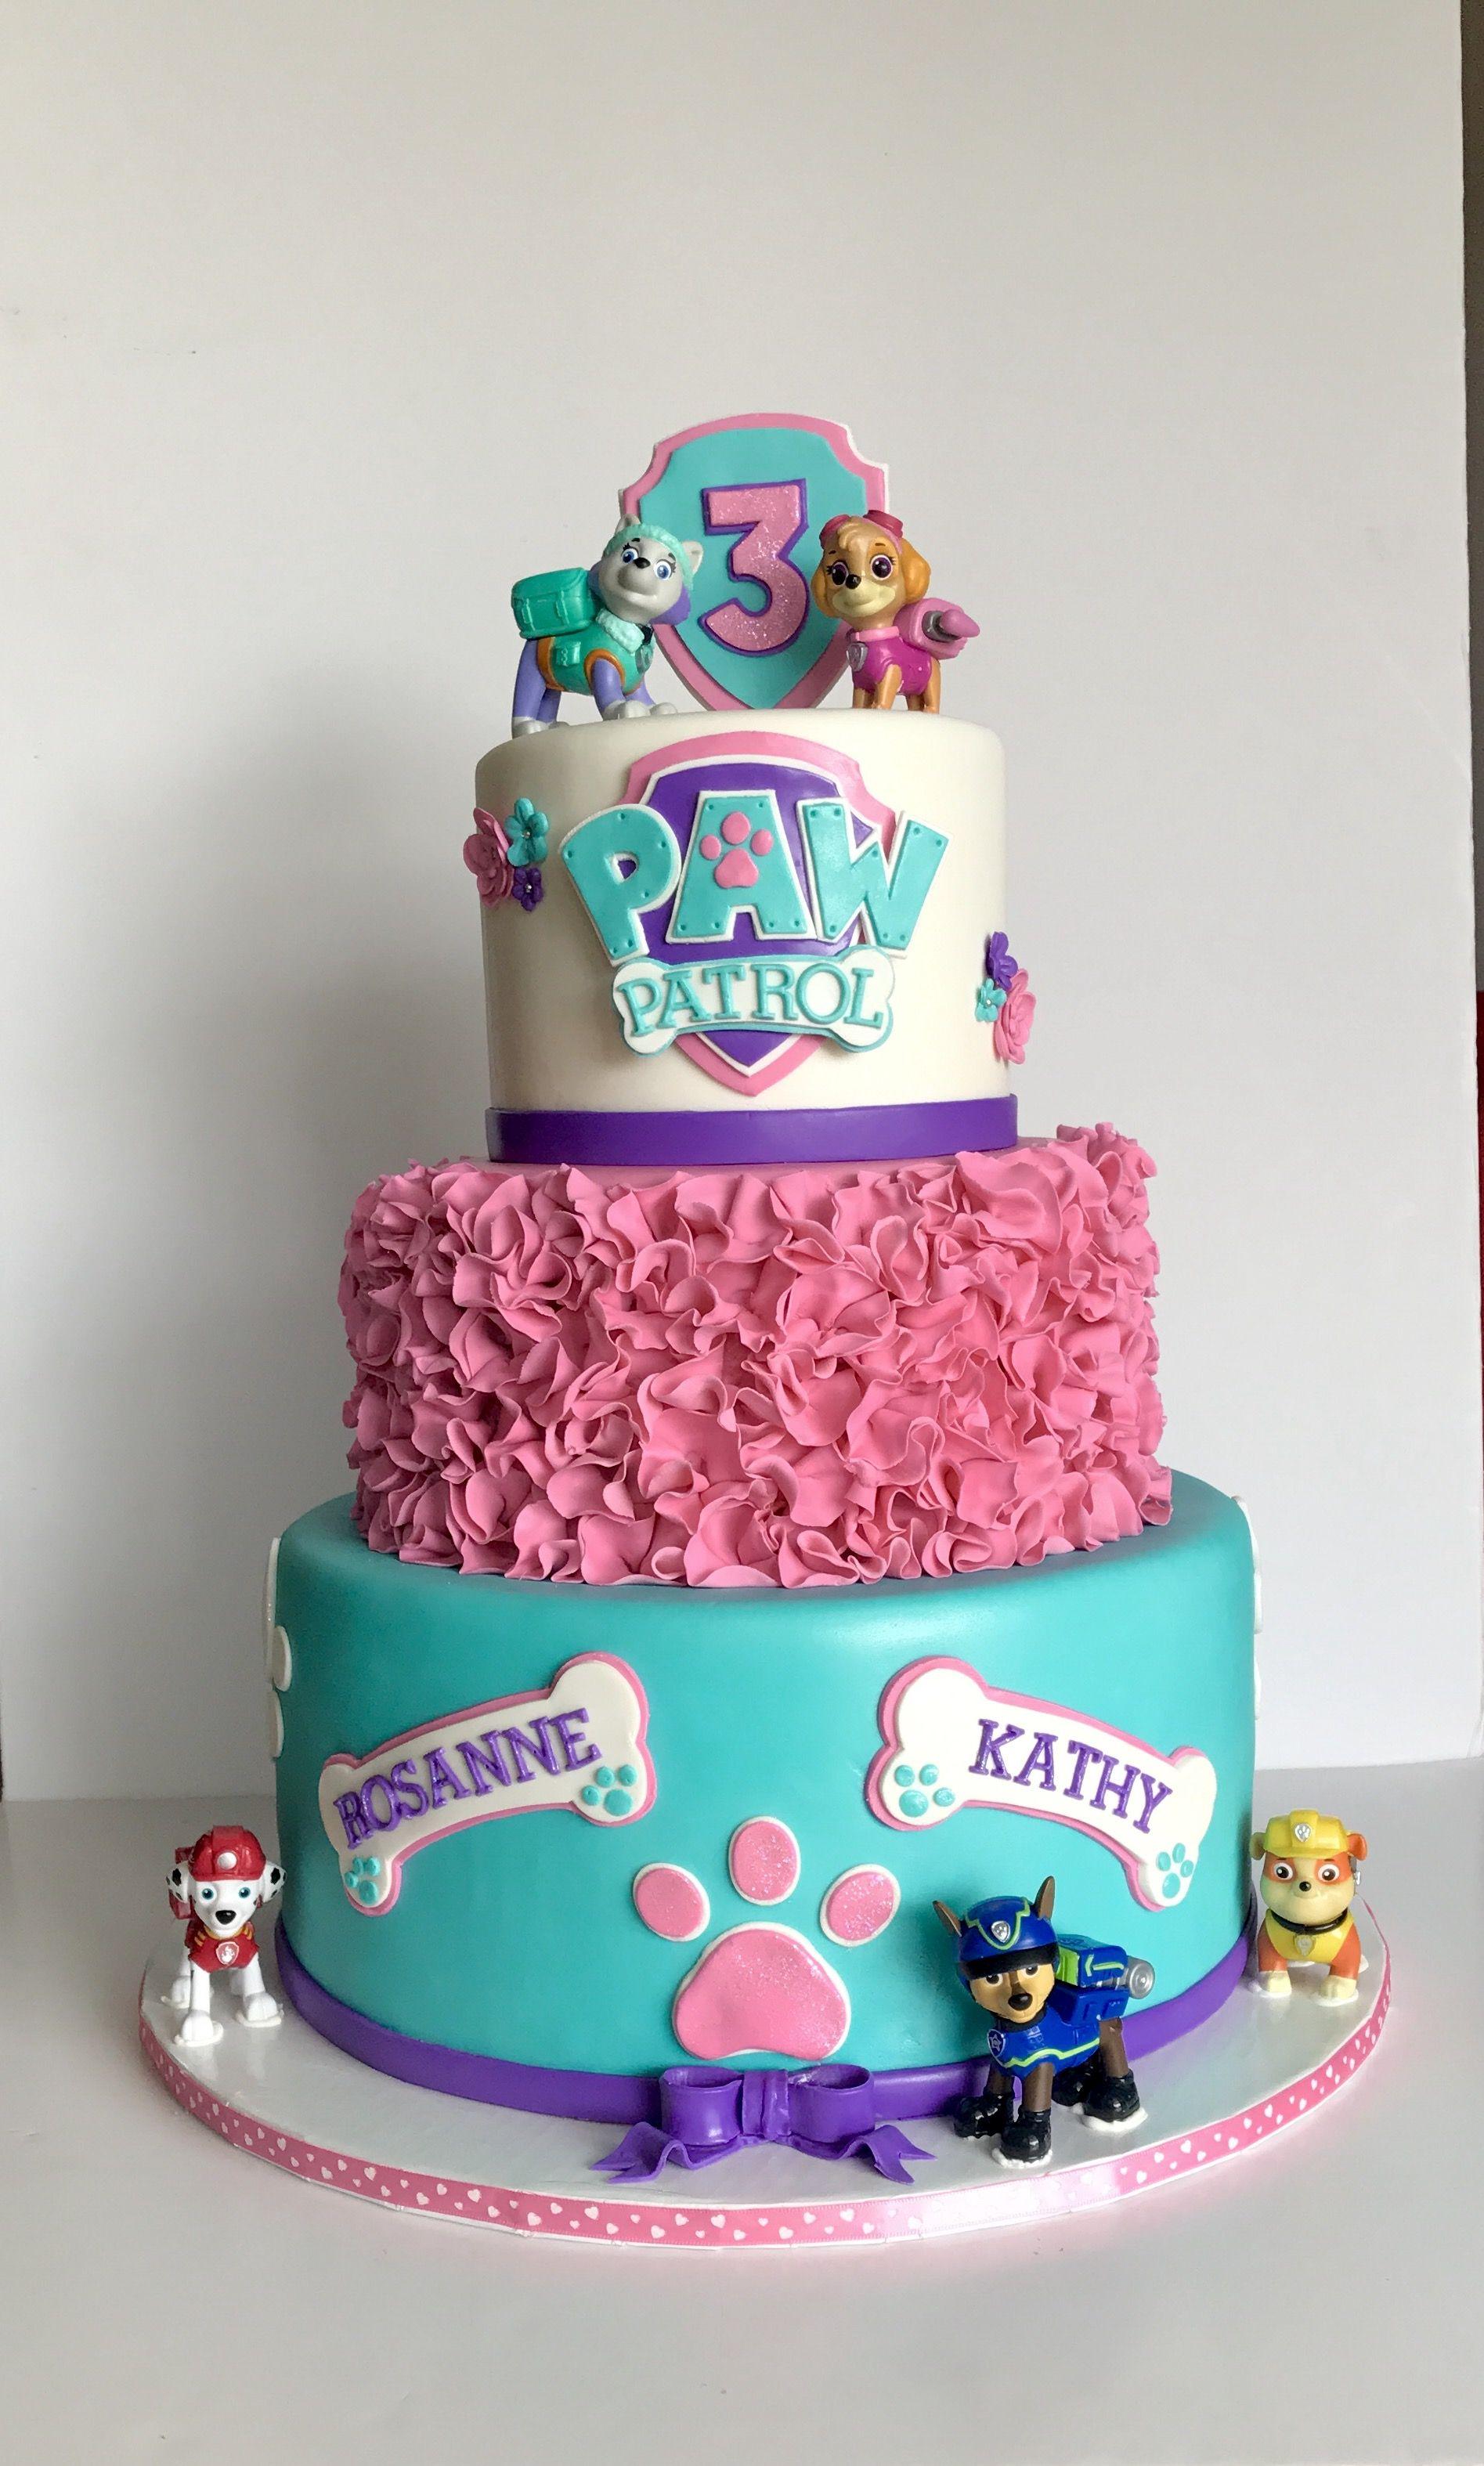 Girly Paw Patrol Cake With Images Paw Patrol Birthday Cake